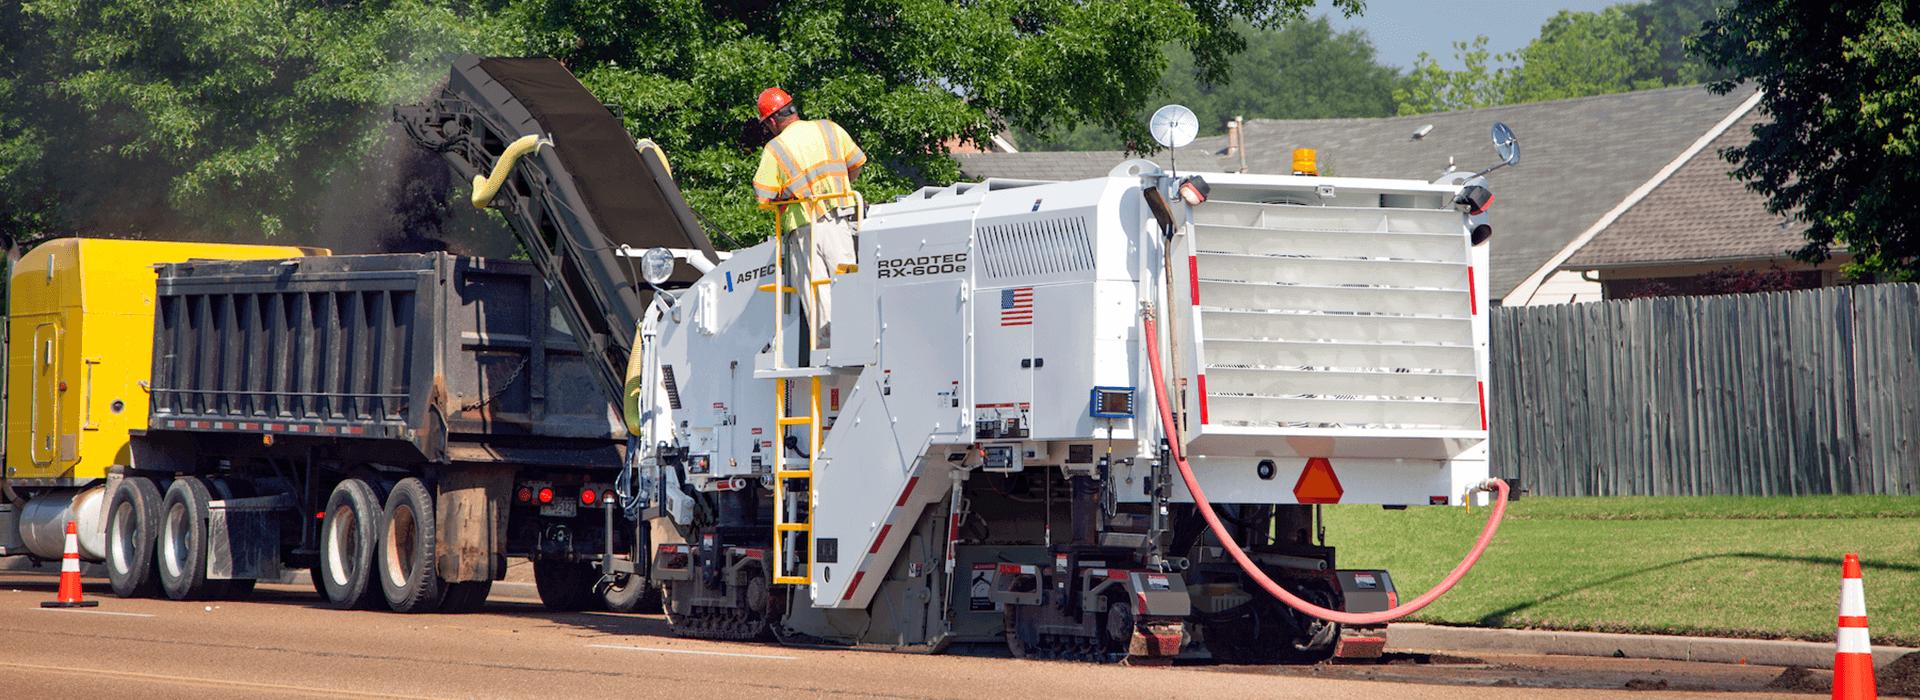 Roadtec RX-600 Cold Planer milling asphalt of road surface into a dump truck